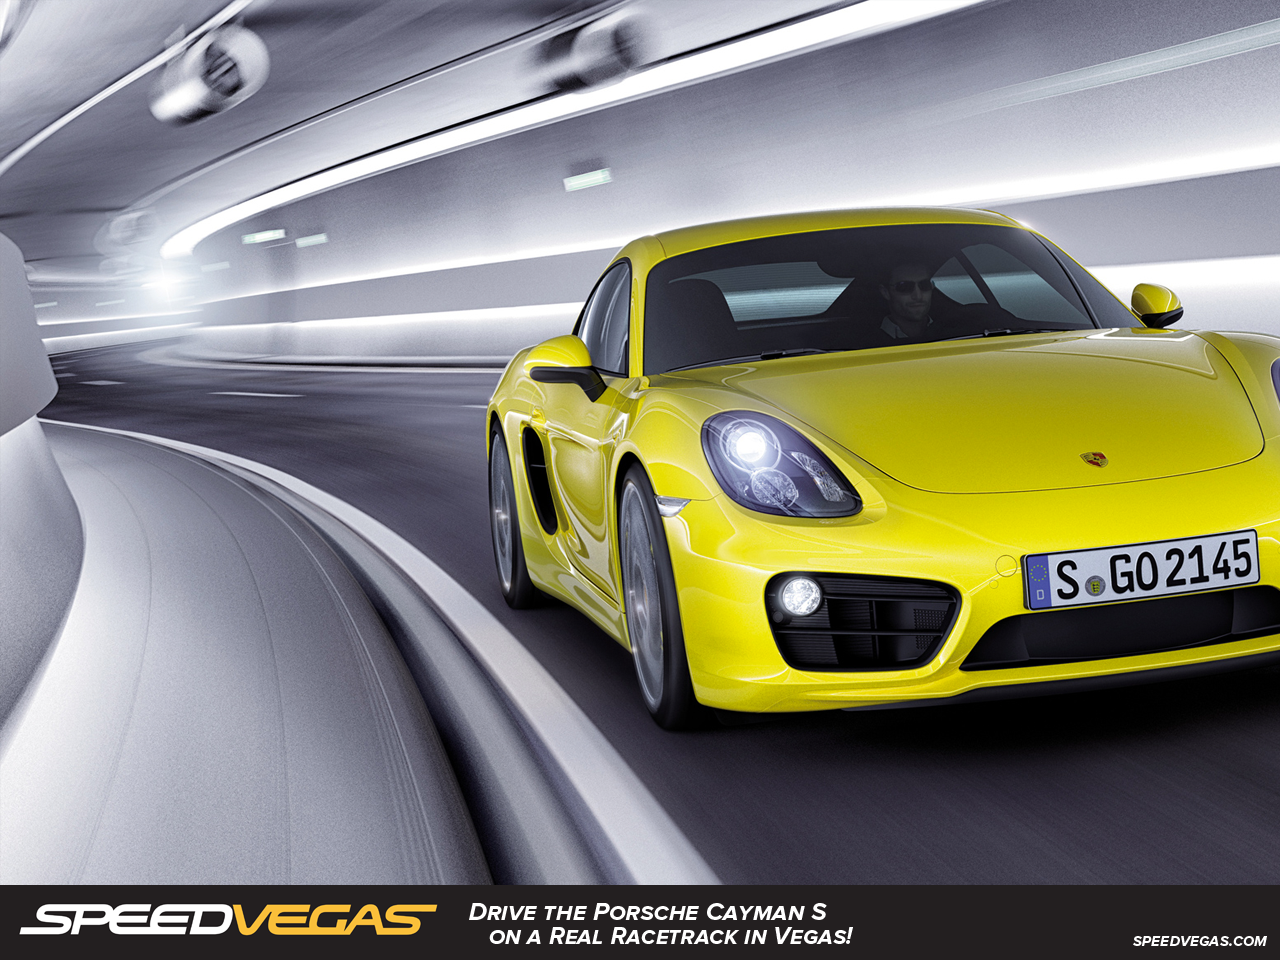 dream cars italia ride mile youtube review watch vegas gotham drive spider supercar test experience las ferrari